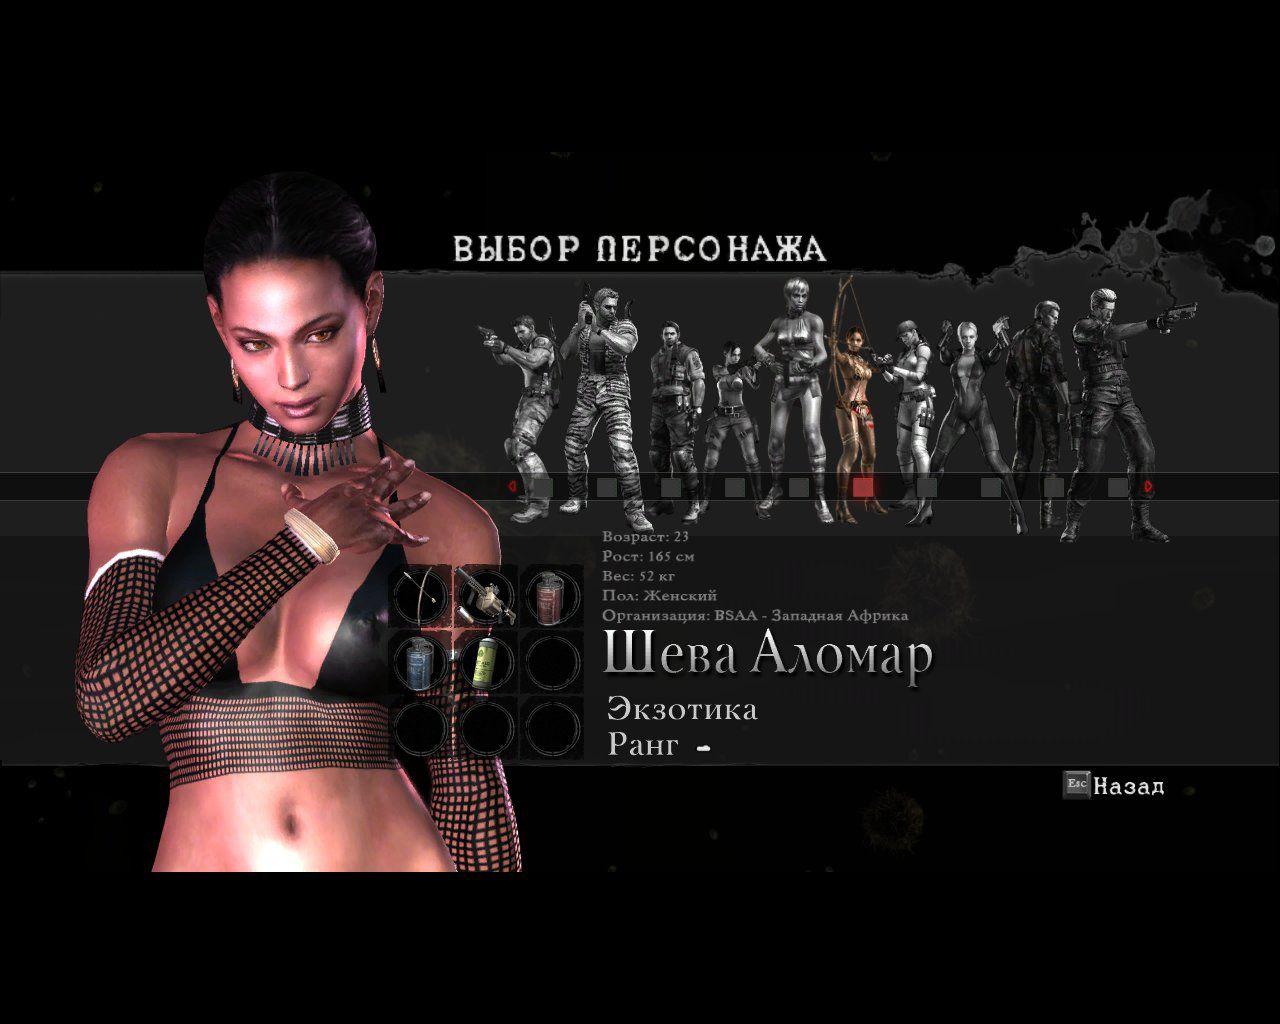 Resident Evil 5 Мод костюма Sheva-Tribal - Файлы - патч, демо,